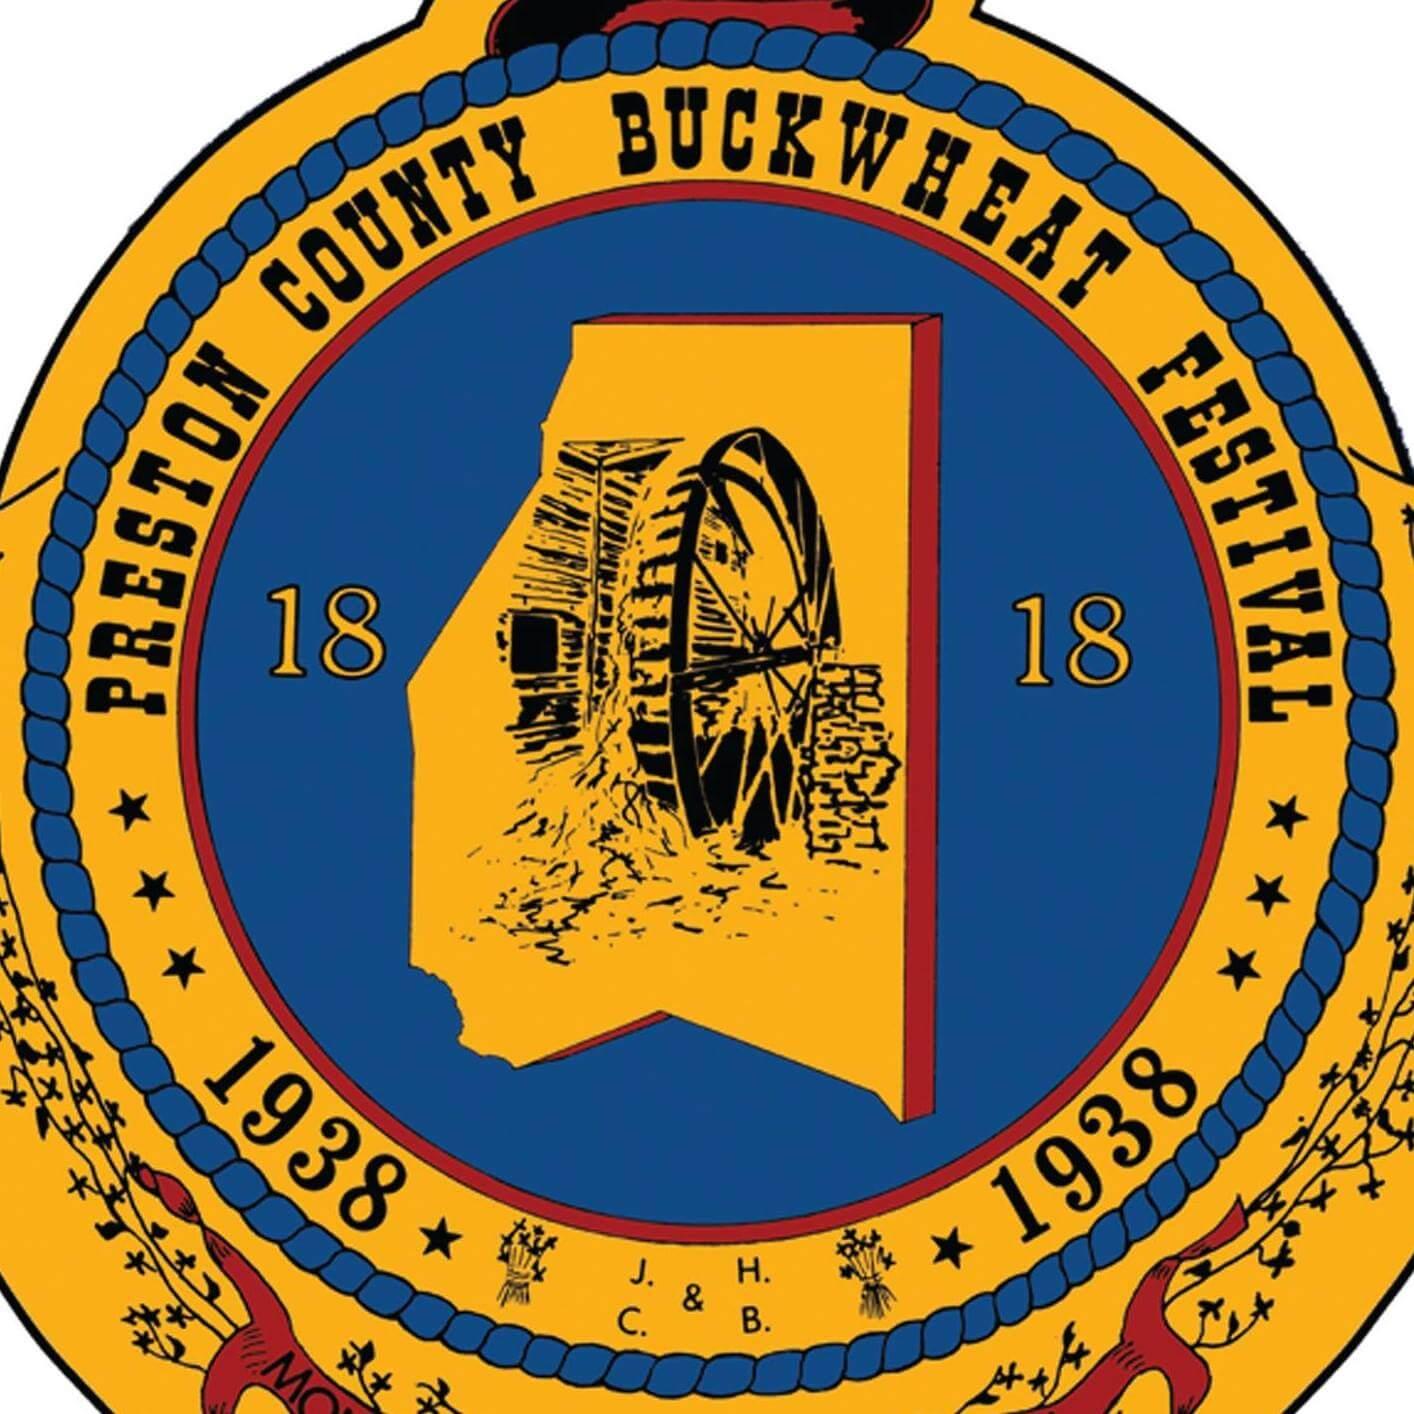 Preston County Buckwheat Festival